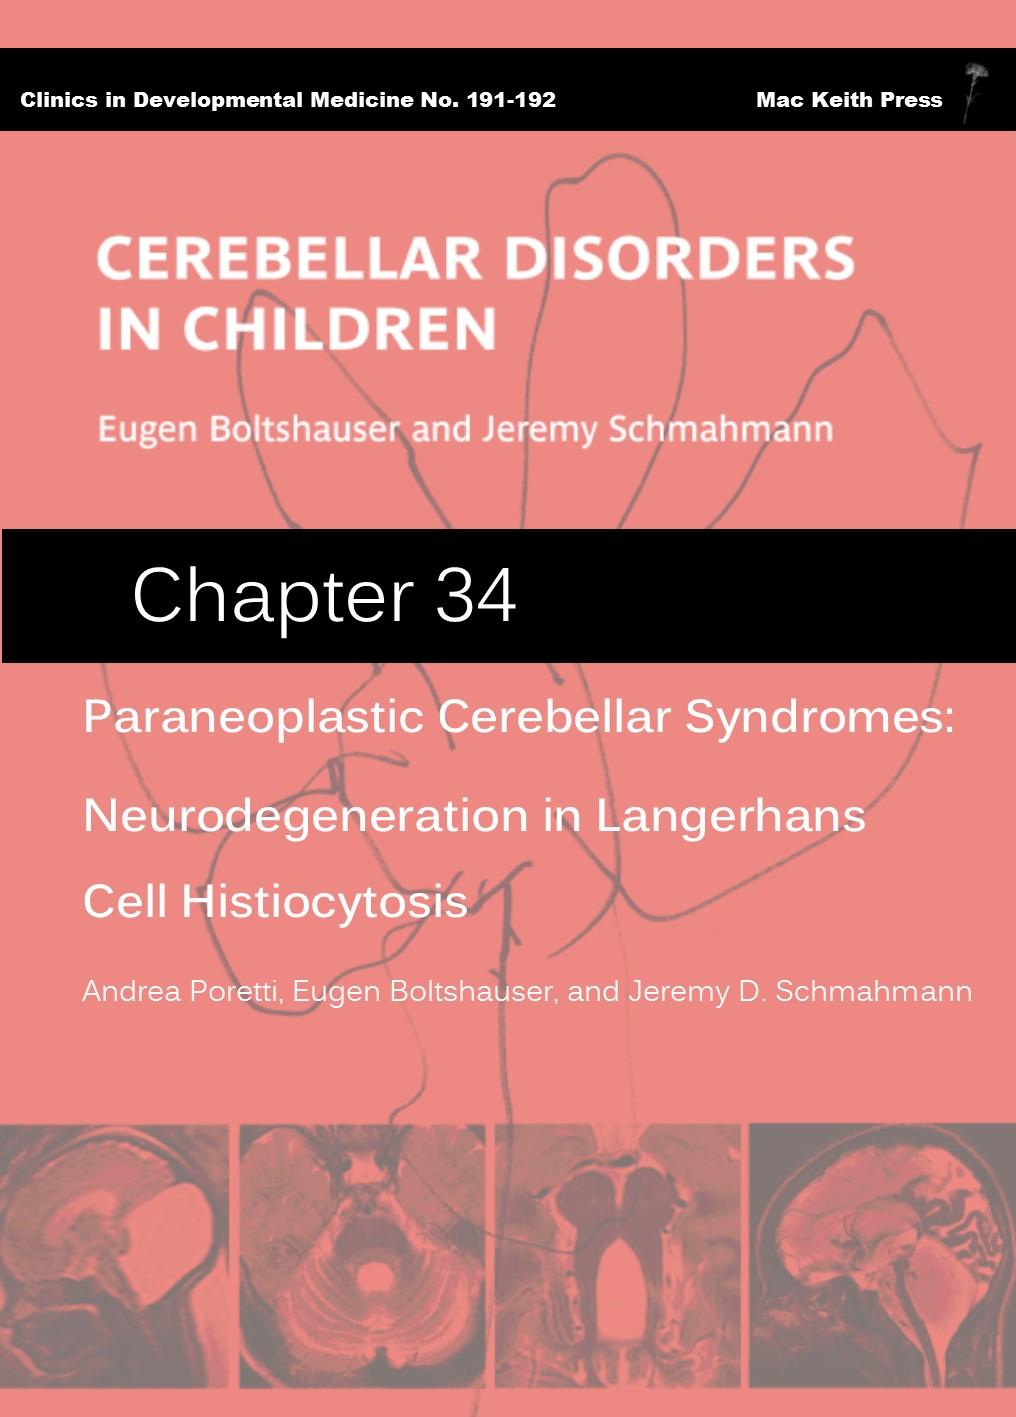 Paraneoplastic Cerebellar Syndromes - Cerebellar Disorders in Children (Chapter 34) COVER